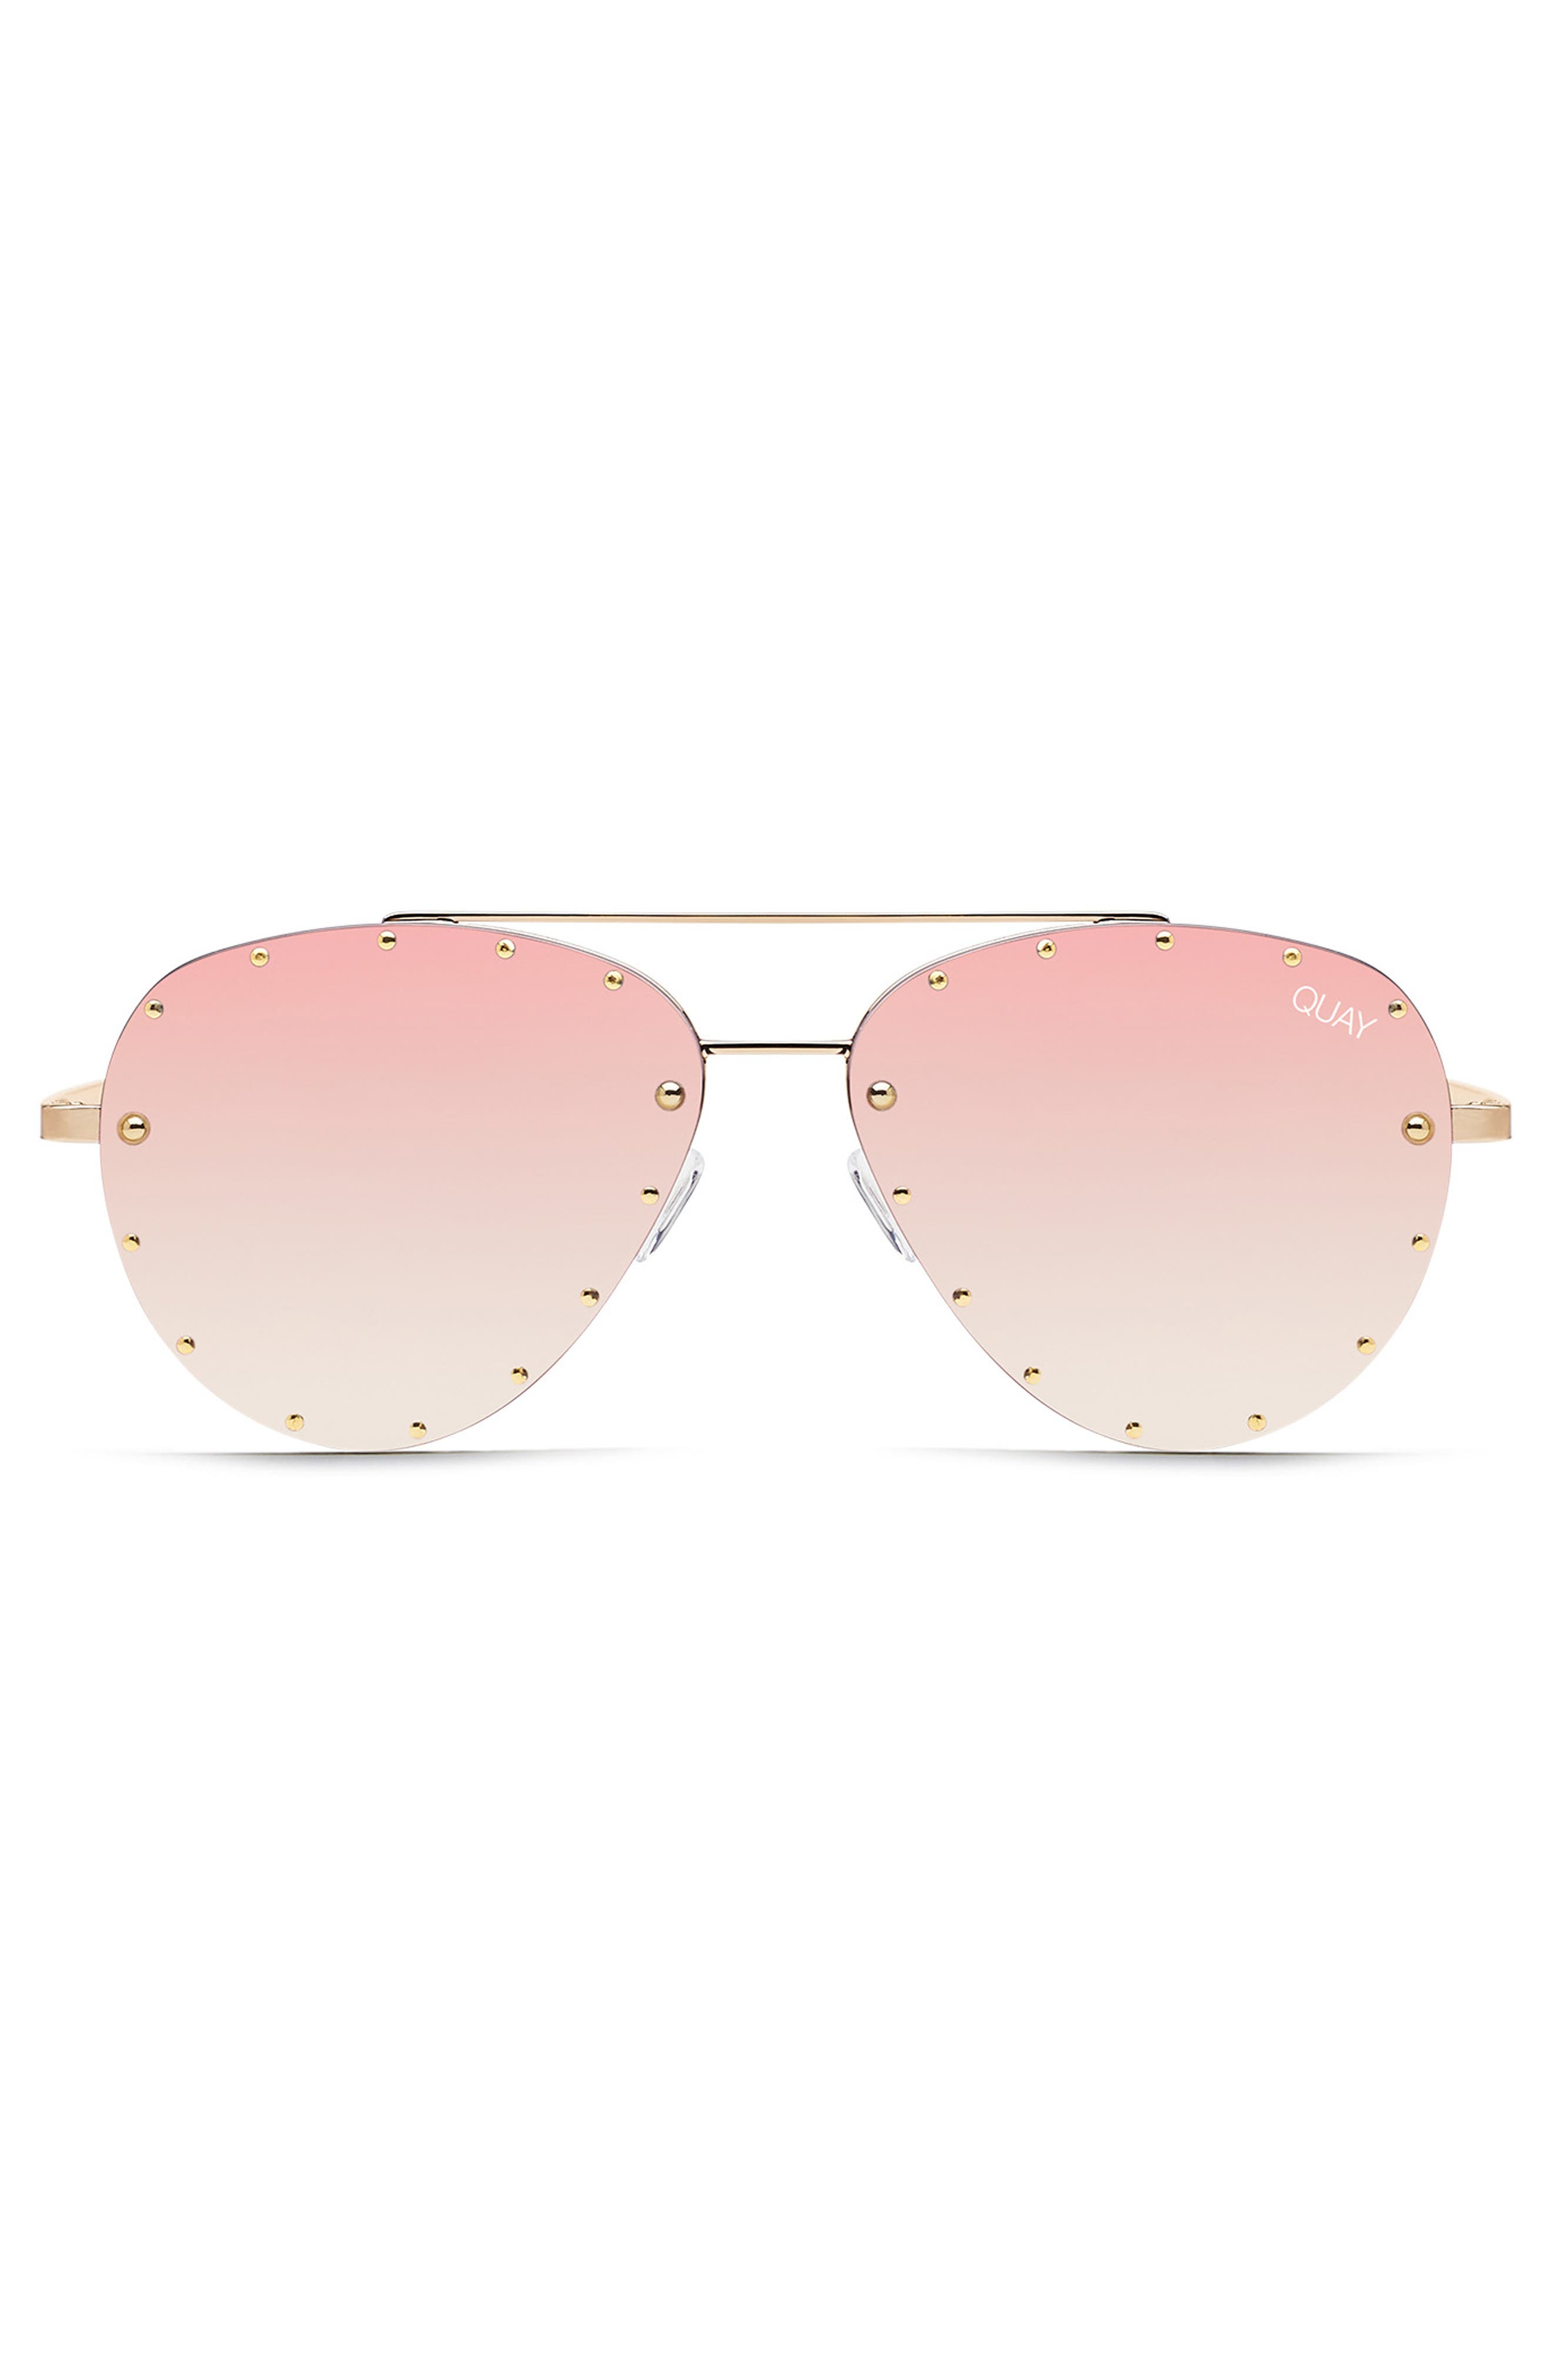 x Jaclyn Hill Roxanne 62mm Stud Aviator Sunglasses,                             Alternate thumbnail 2, color,                             GOLD / ROSE